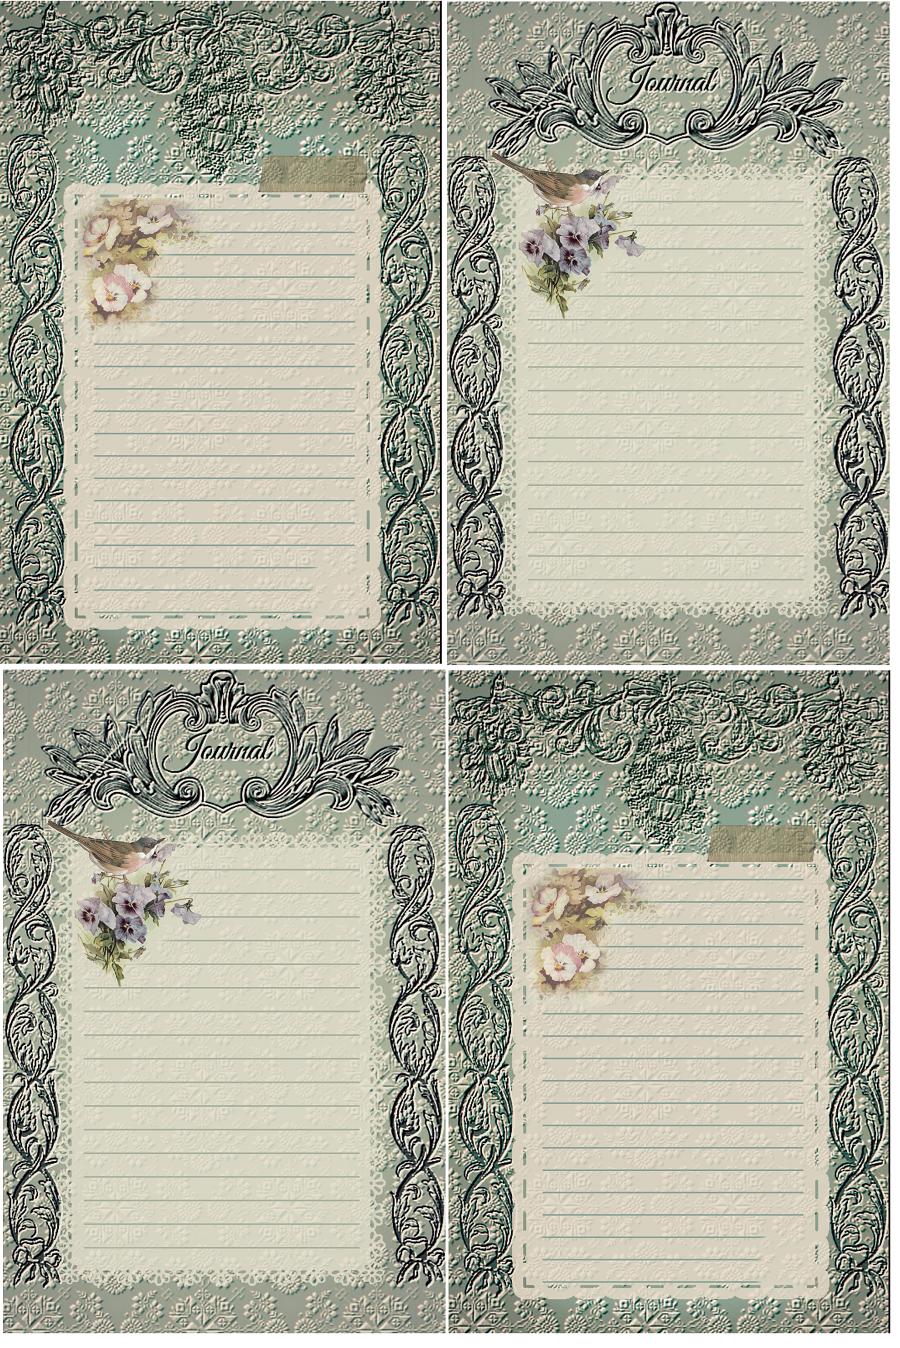 Vintage In Teal Journal Cards Vintage Junk Journal Journal Cards Vintage Journal